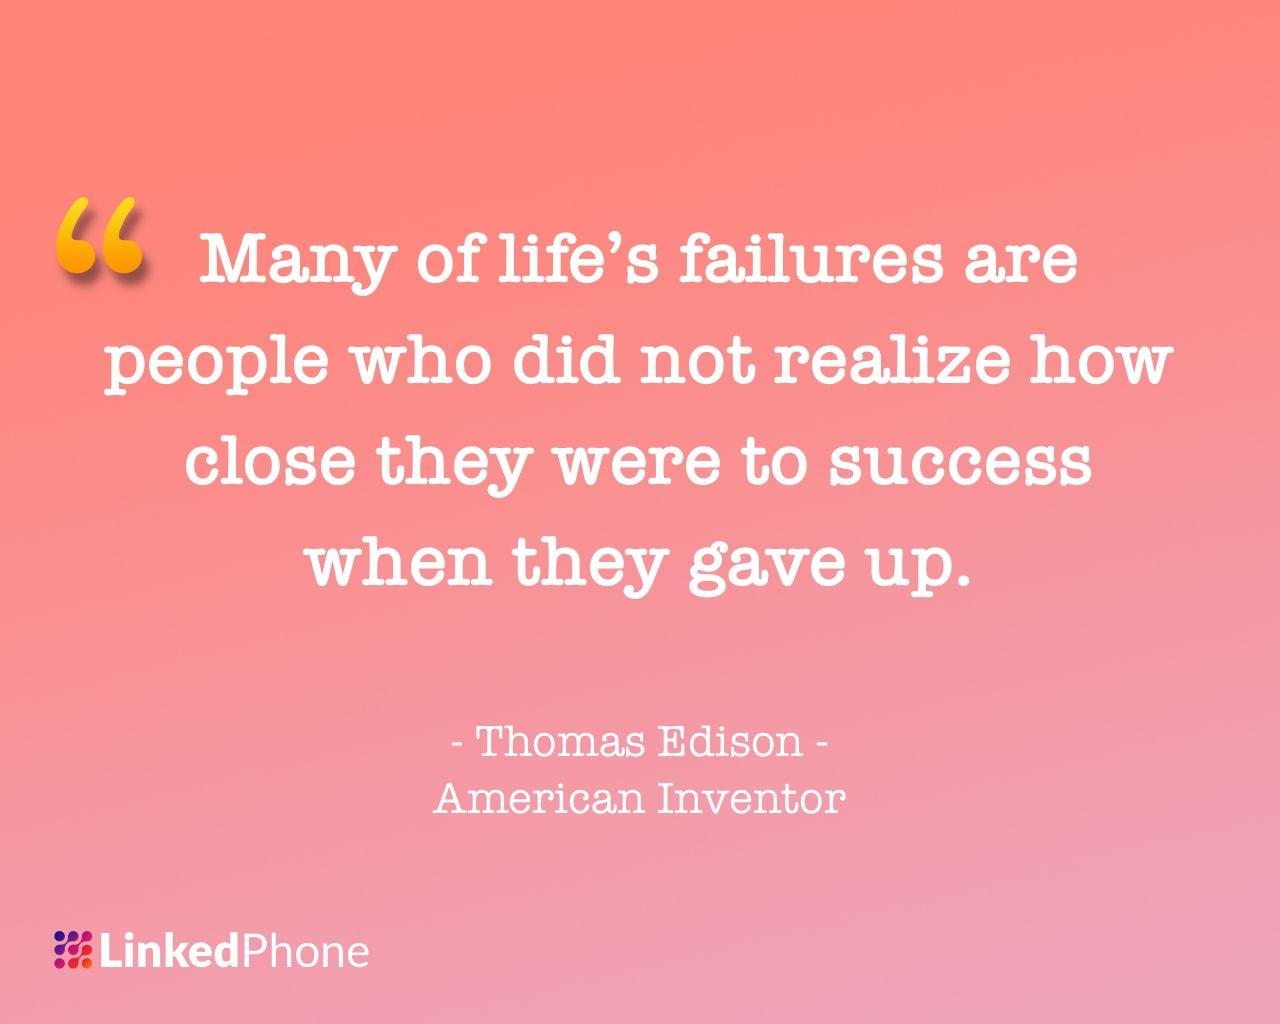 Thomas Edison - Motivational Inspirational Quotes and Sayings